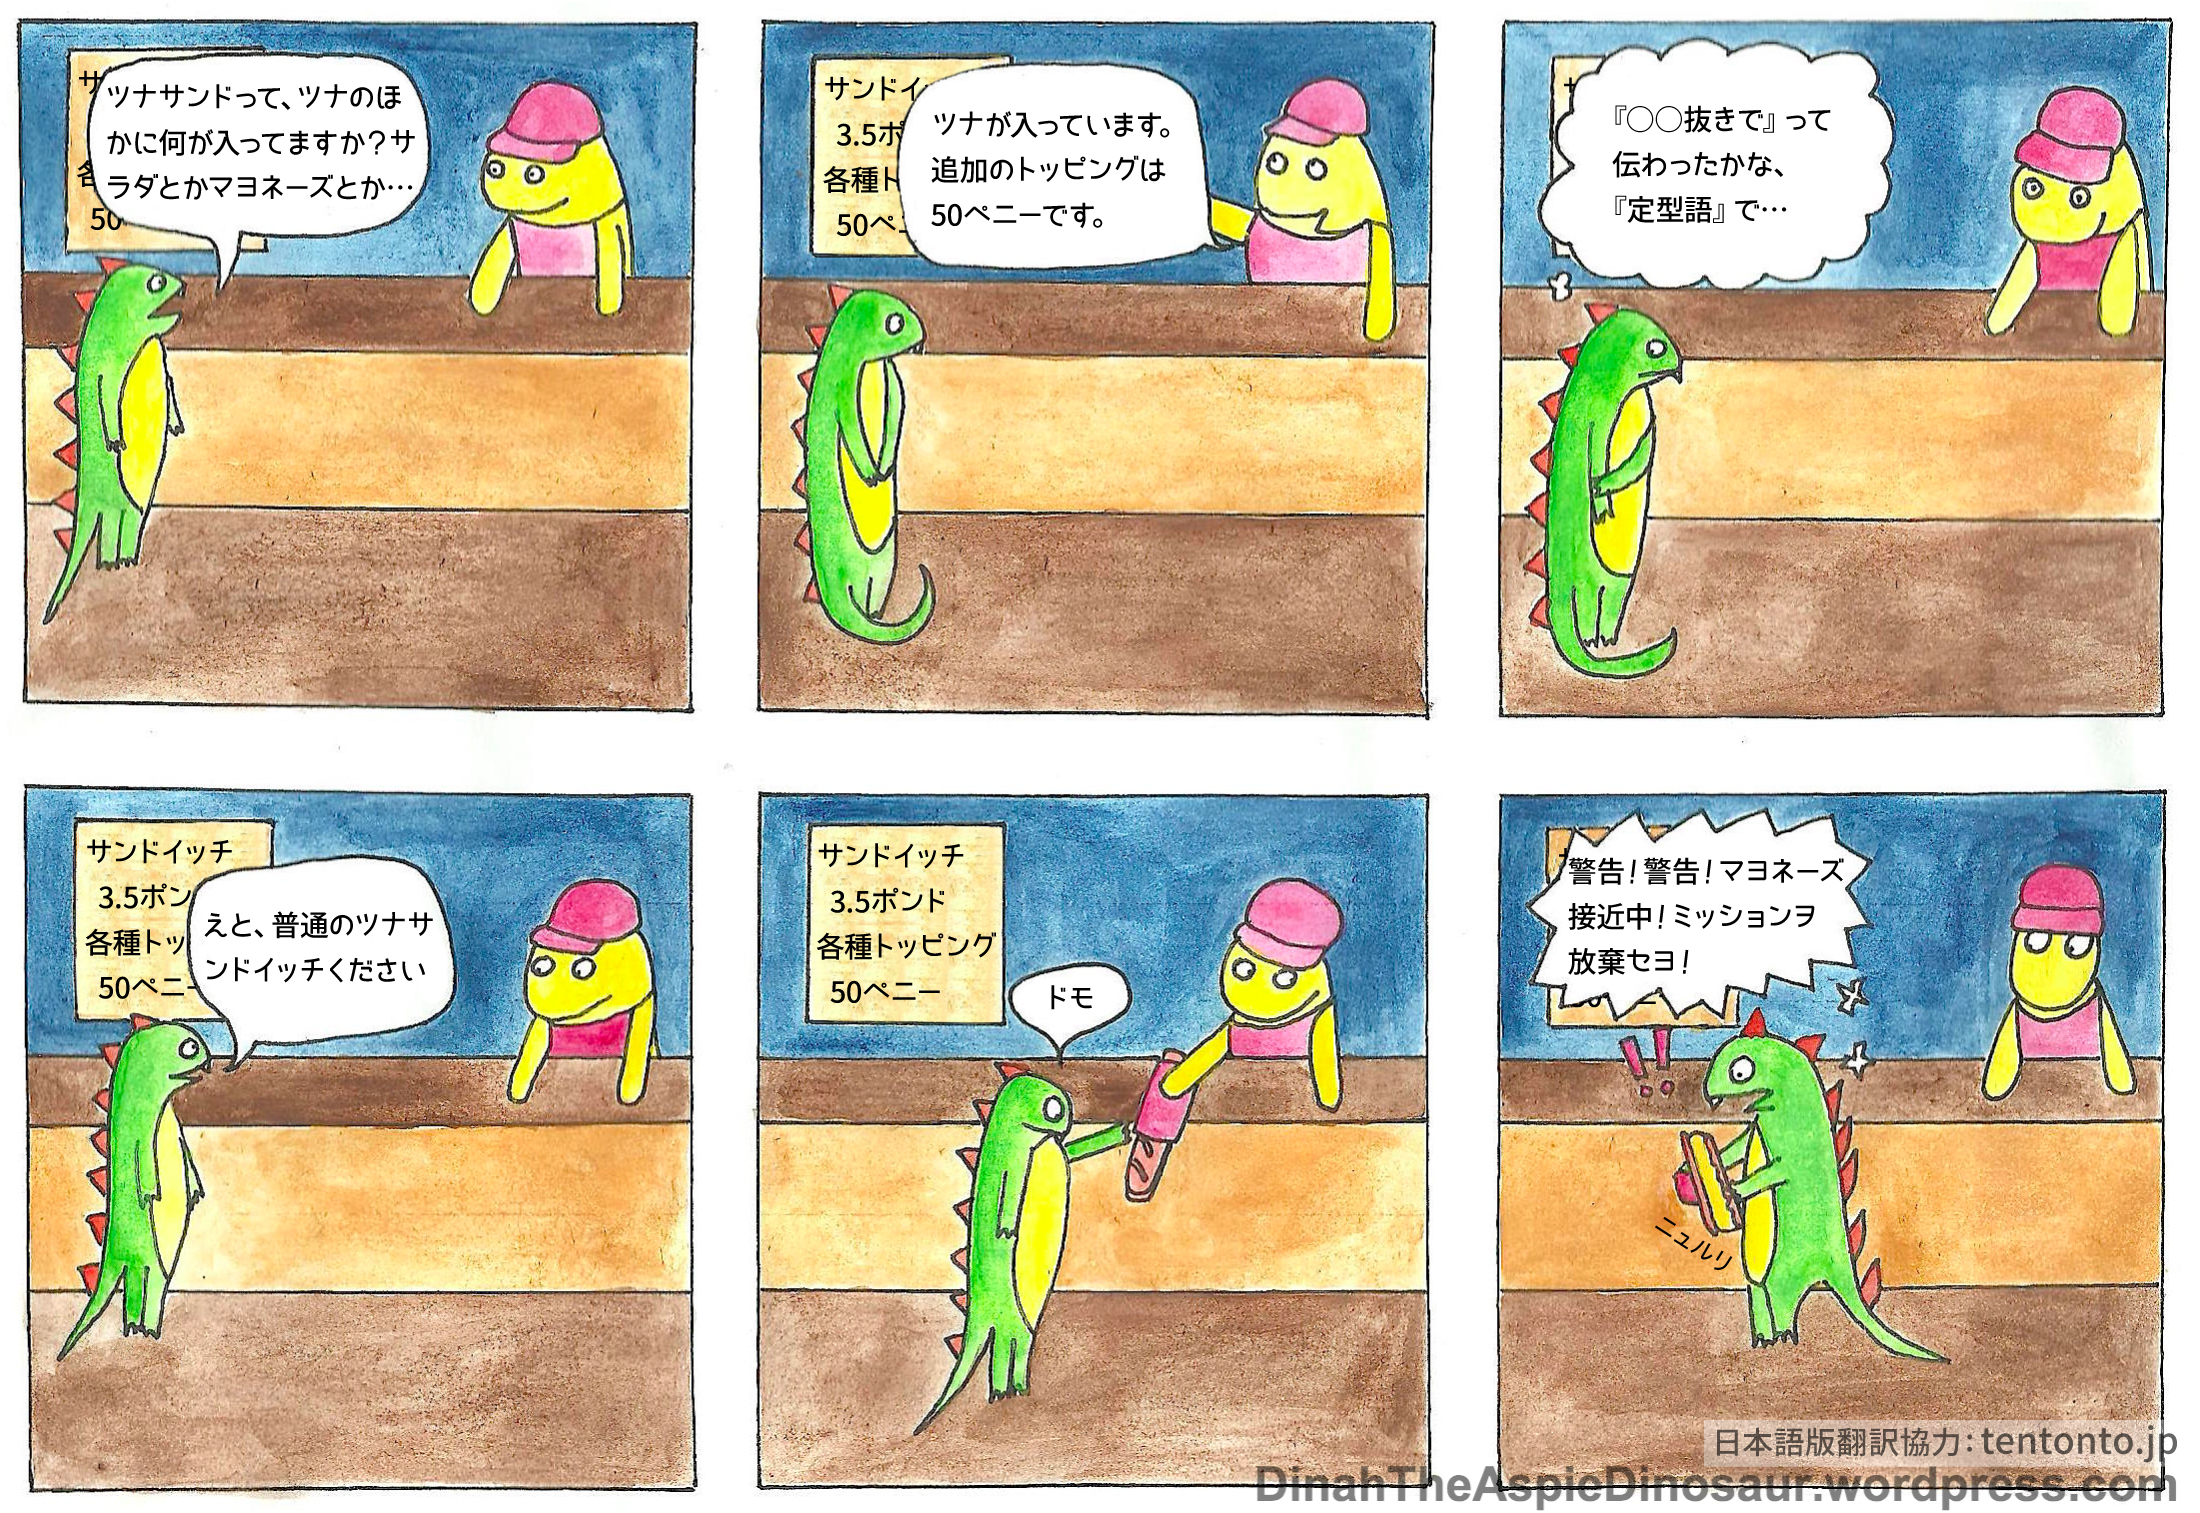 dinah-sandwich-jpn